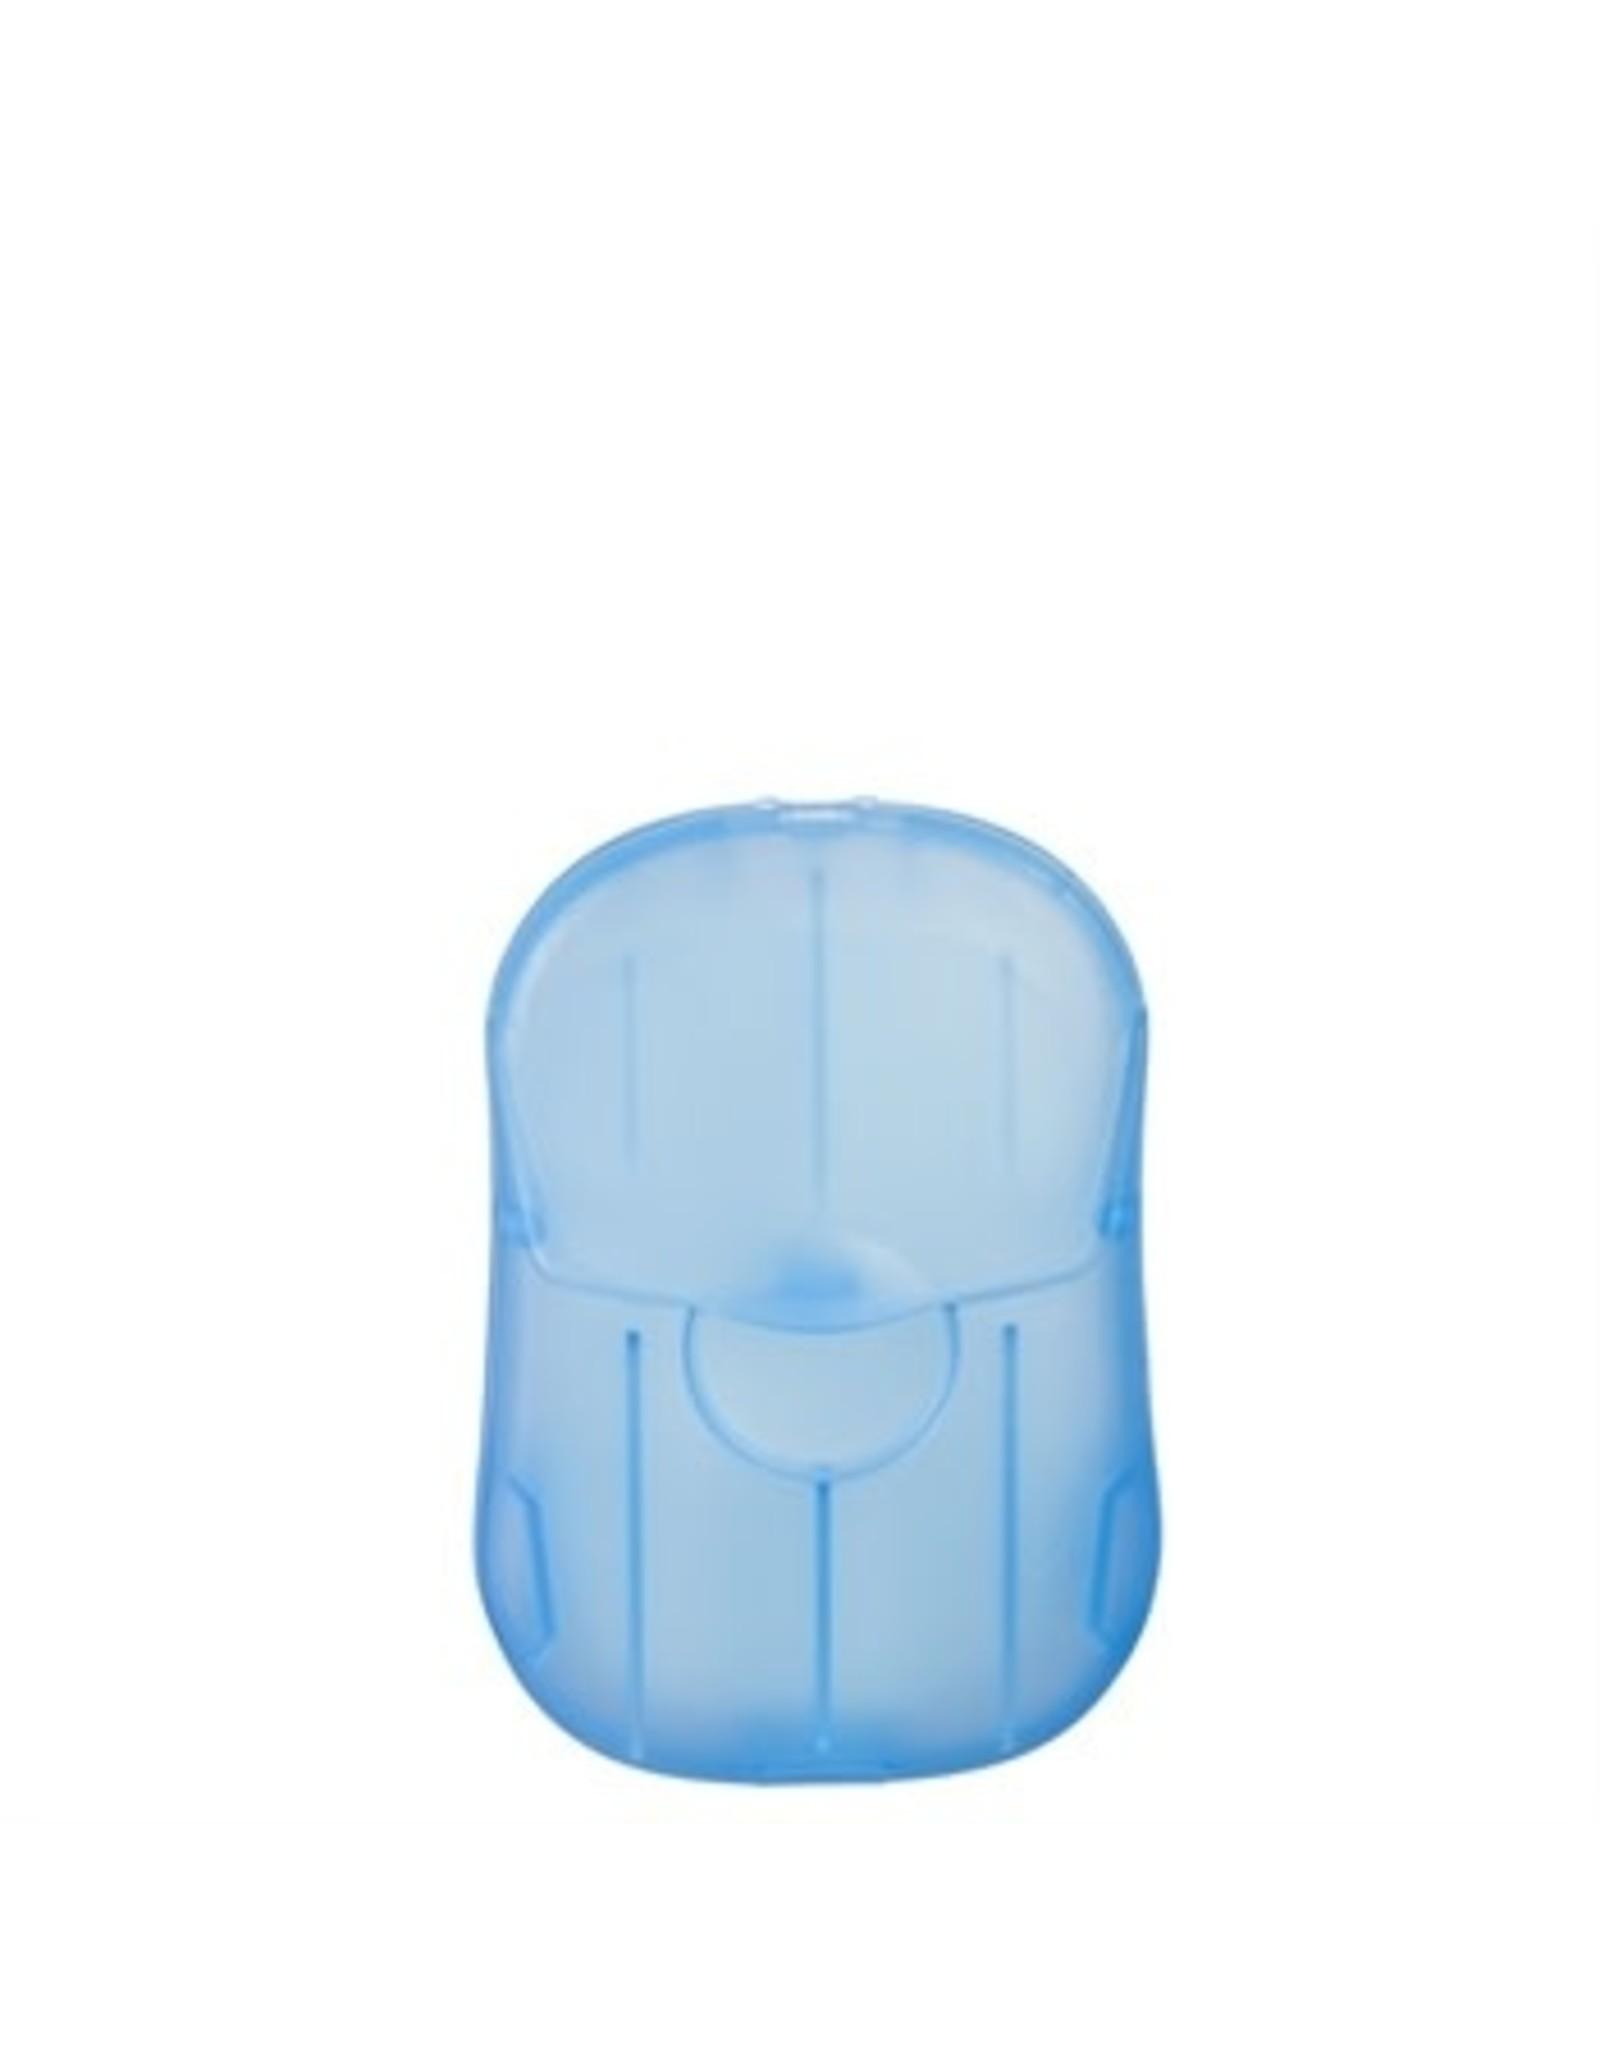 Evergreen Enterprises Portable Soap Sheets - 20 ct.